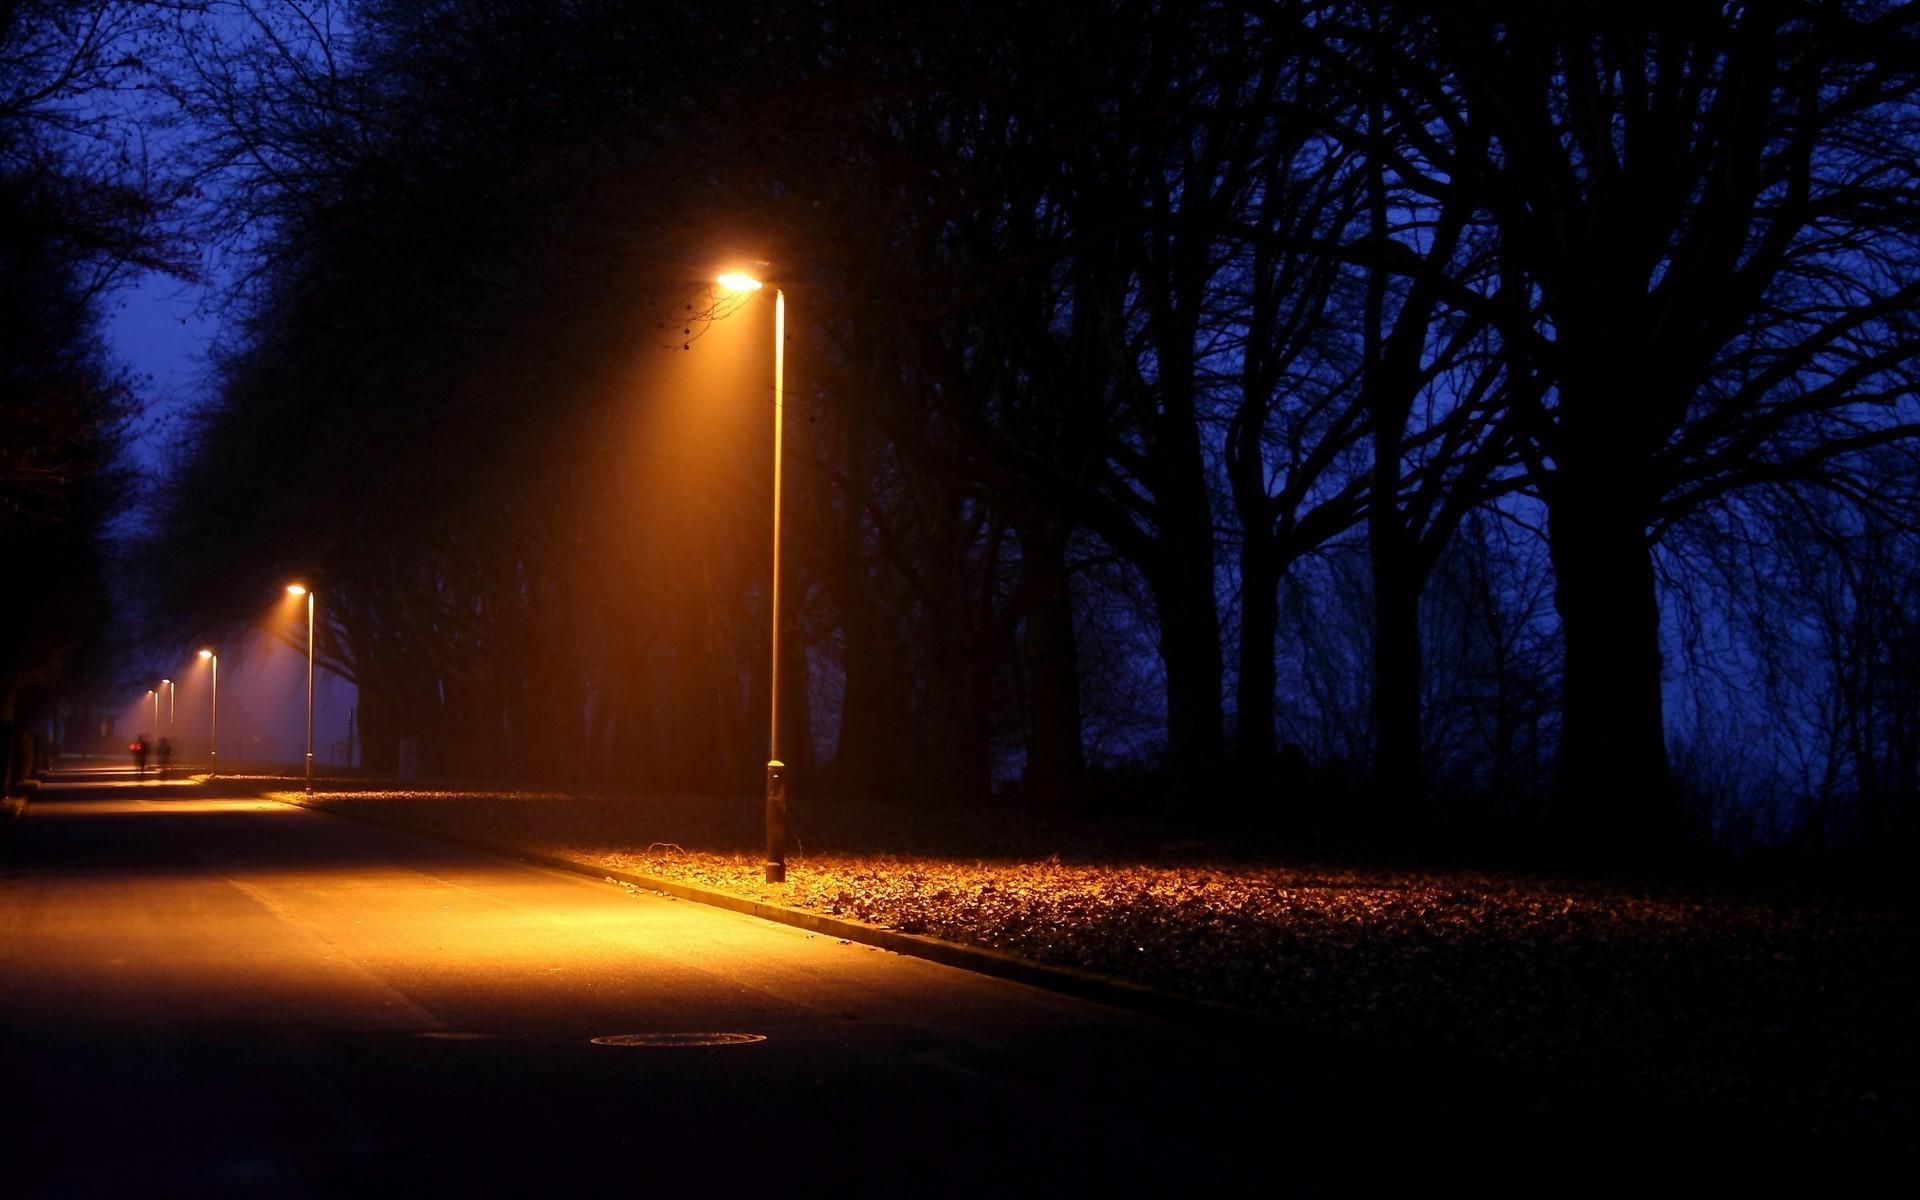 Sunlight Trees Landscape Lights Street Light Night Nature Plants Road Photography Evening Morning Moonlight Atmosphere Dusk